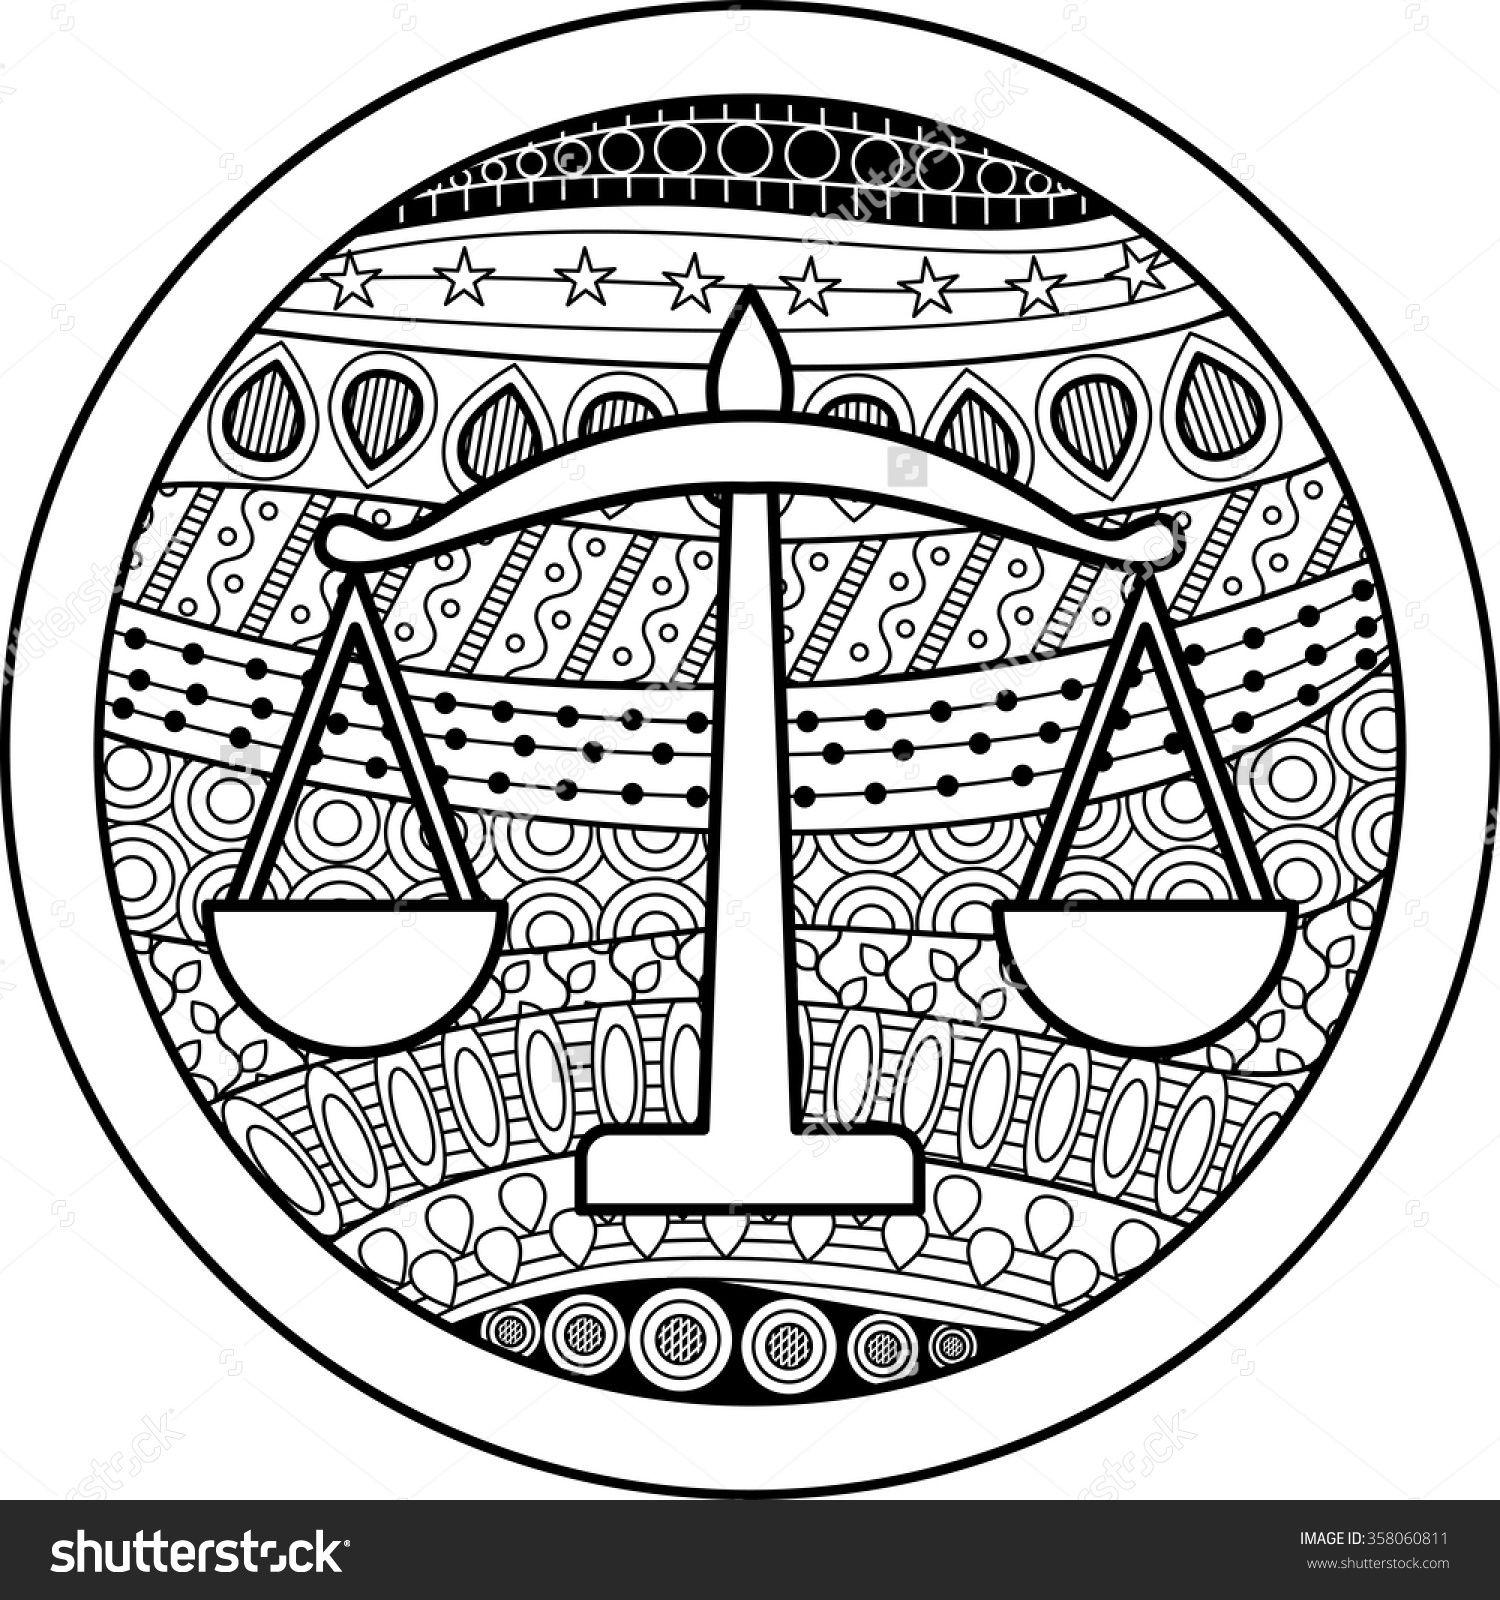 Zodiac sign Libra zentangle | tattoo ideas | Pinterest ...